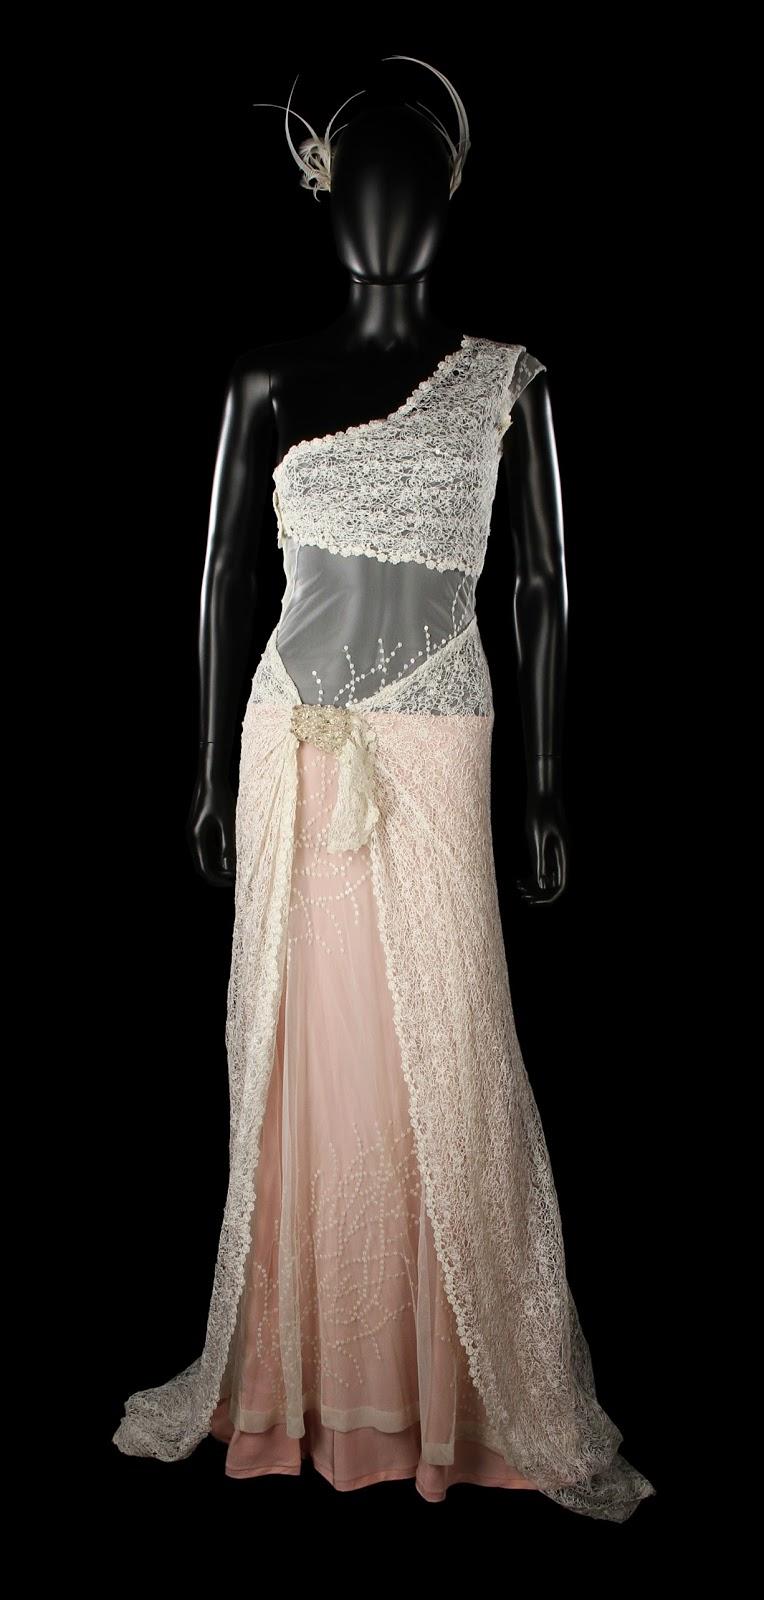 Satchel: Keira Knightley Juliet's Wedding Dress From Love ...